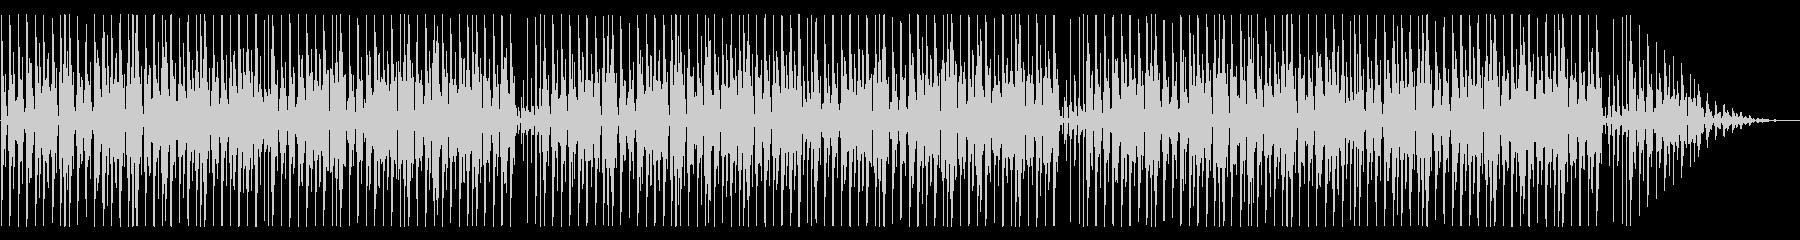 bgm42の未再生の波形